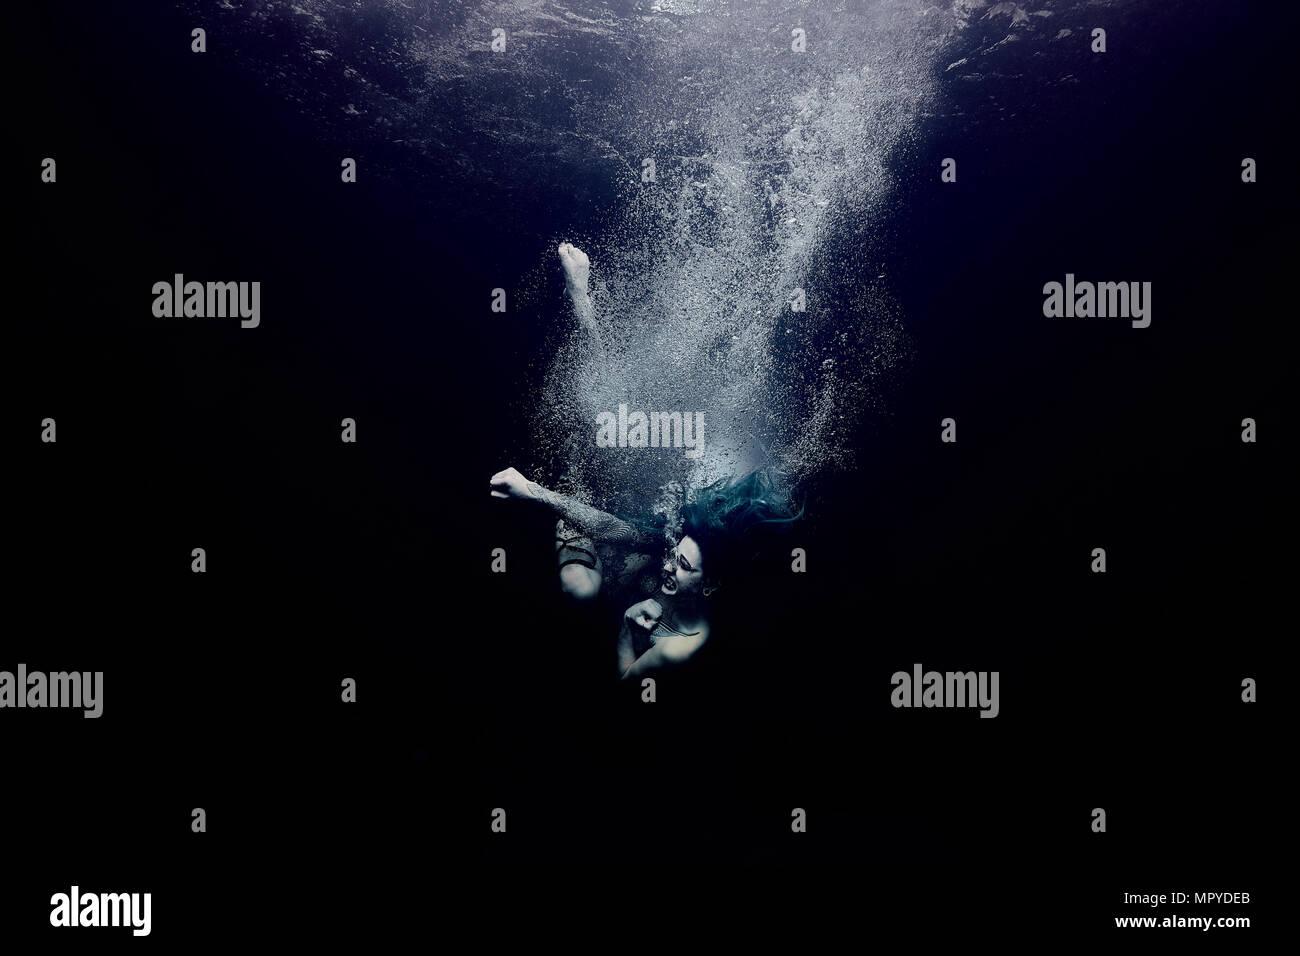 Guerriero subacquea Immagini Stock